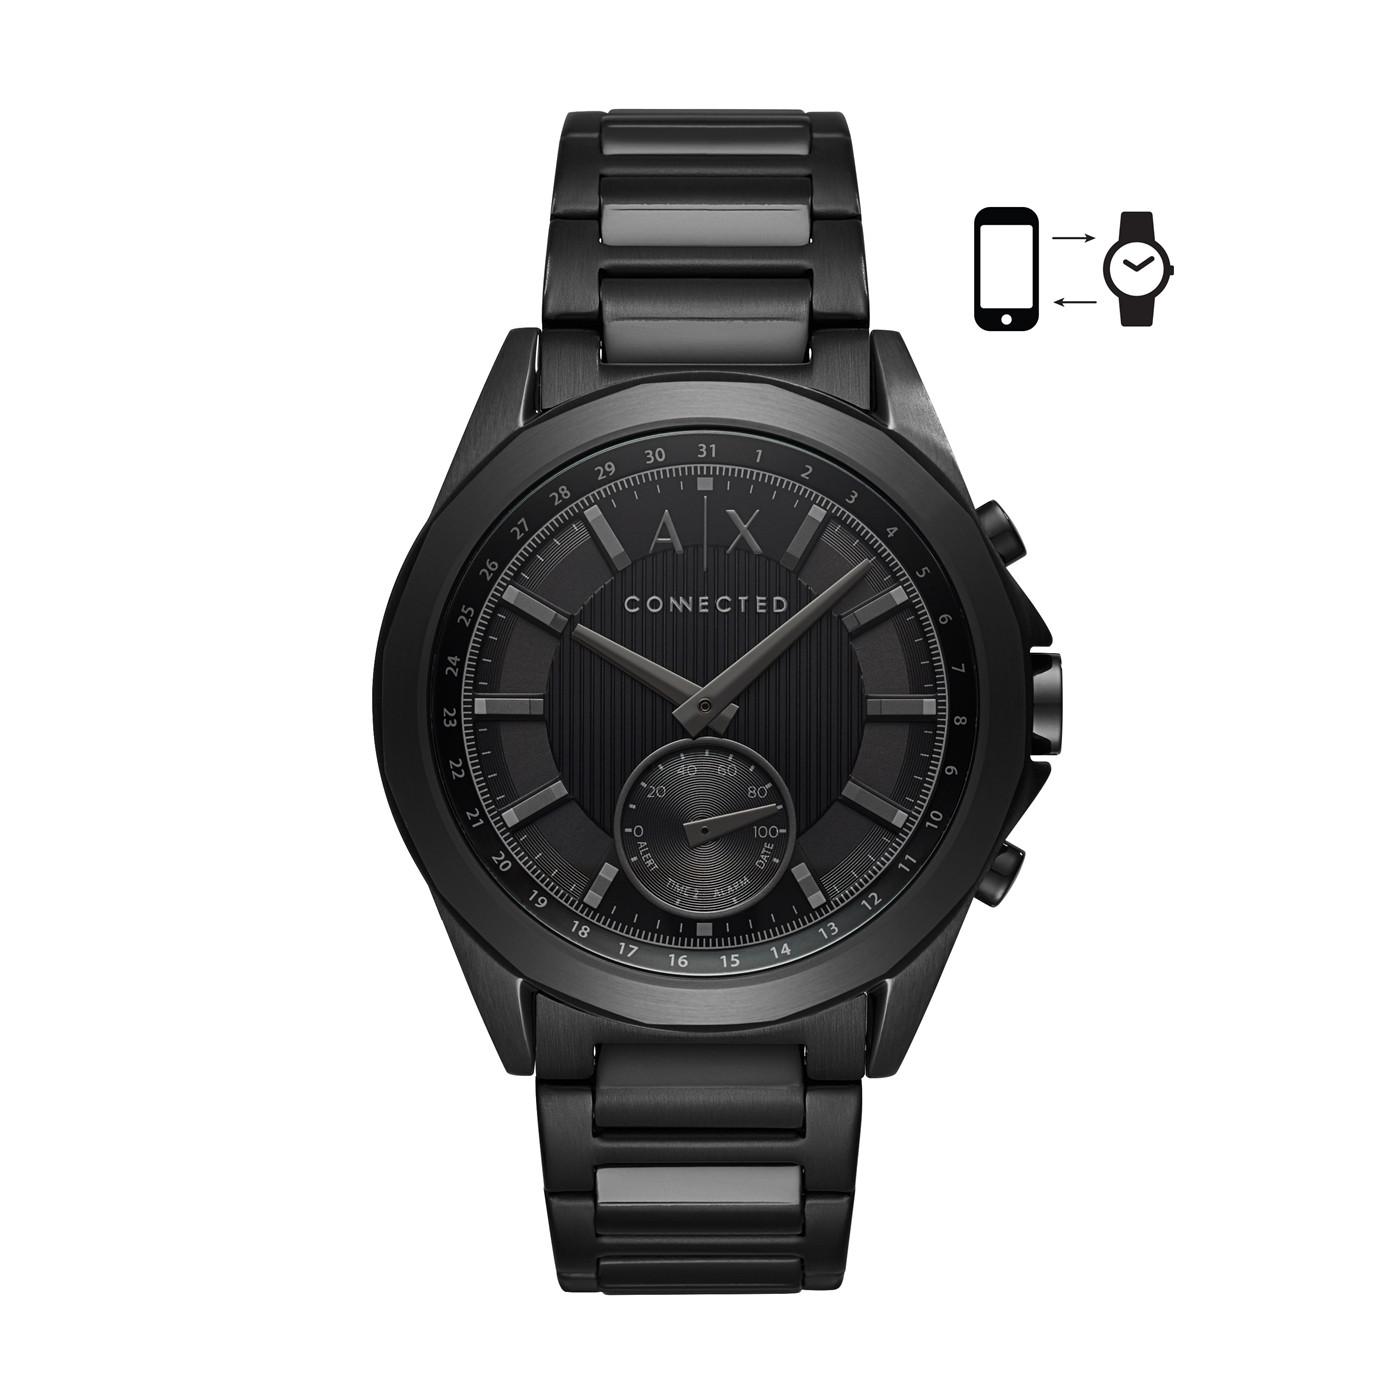 Armani Exchange Connected Drexler Hybrid Smartwatch AXT1007